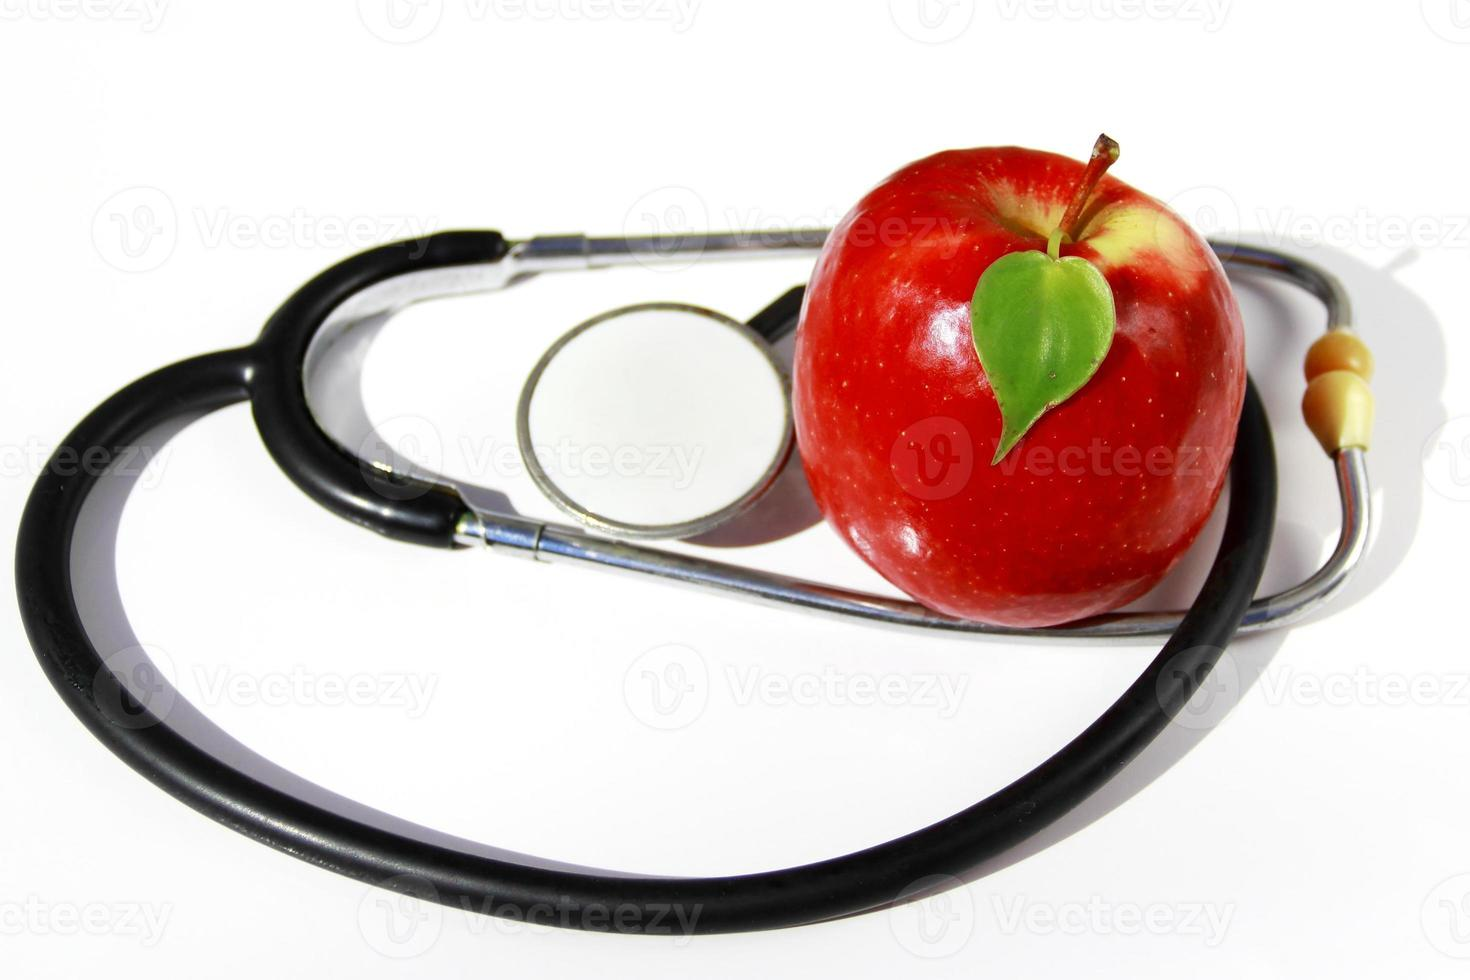 cure sanitarie. foto